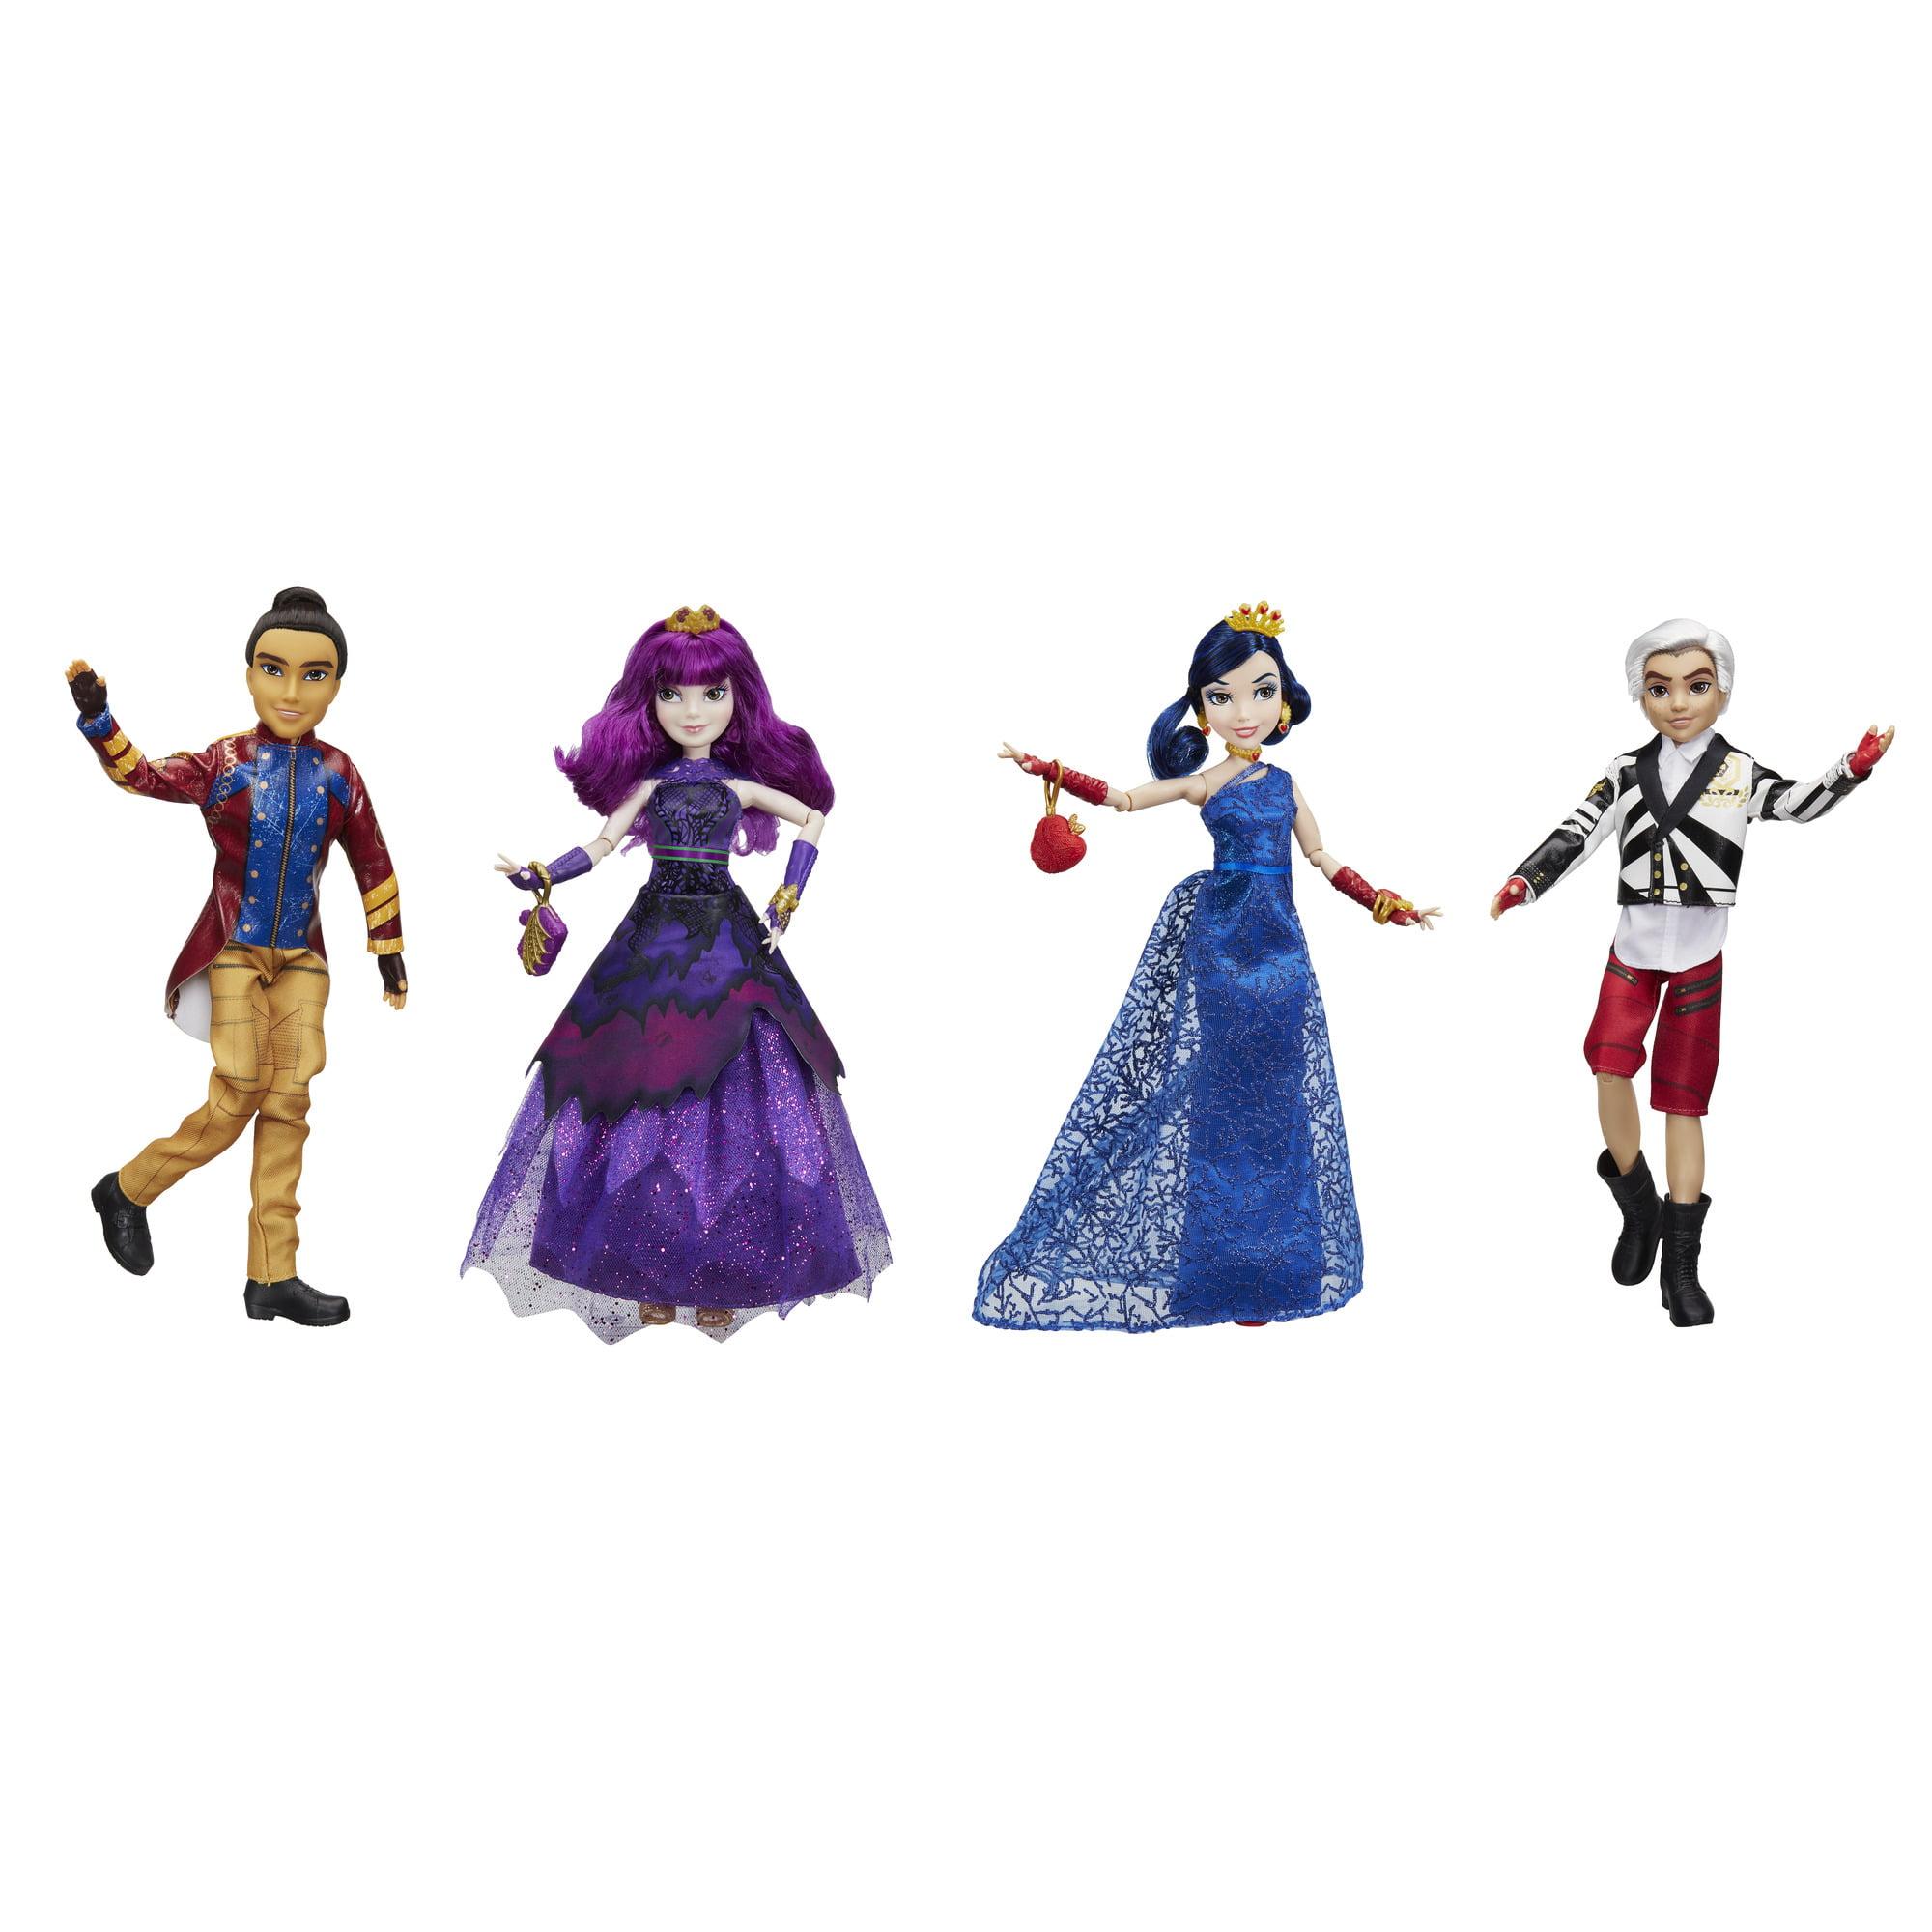 Disney Descendants Isle of the Lost 4-Pack: Mal, Evie, Carlos, & Jay by Hasbro